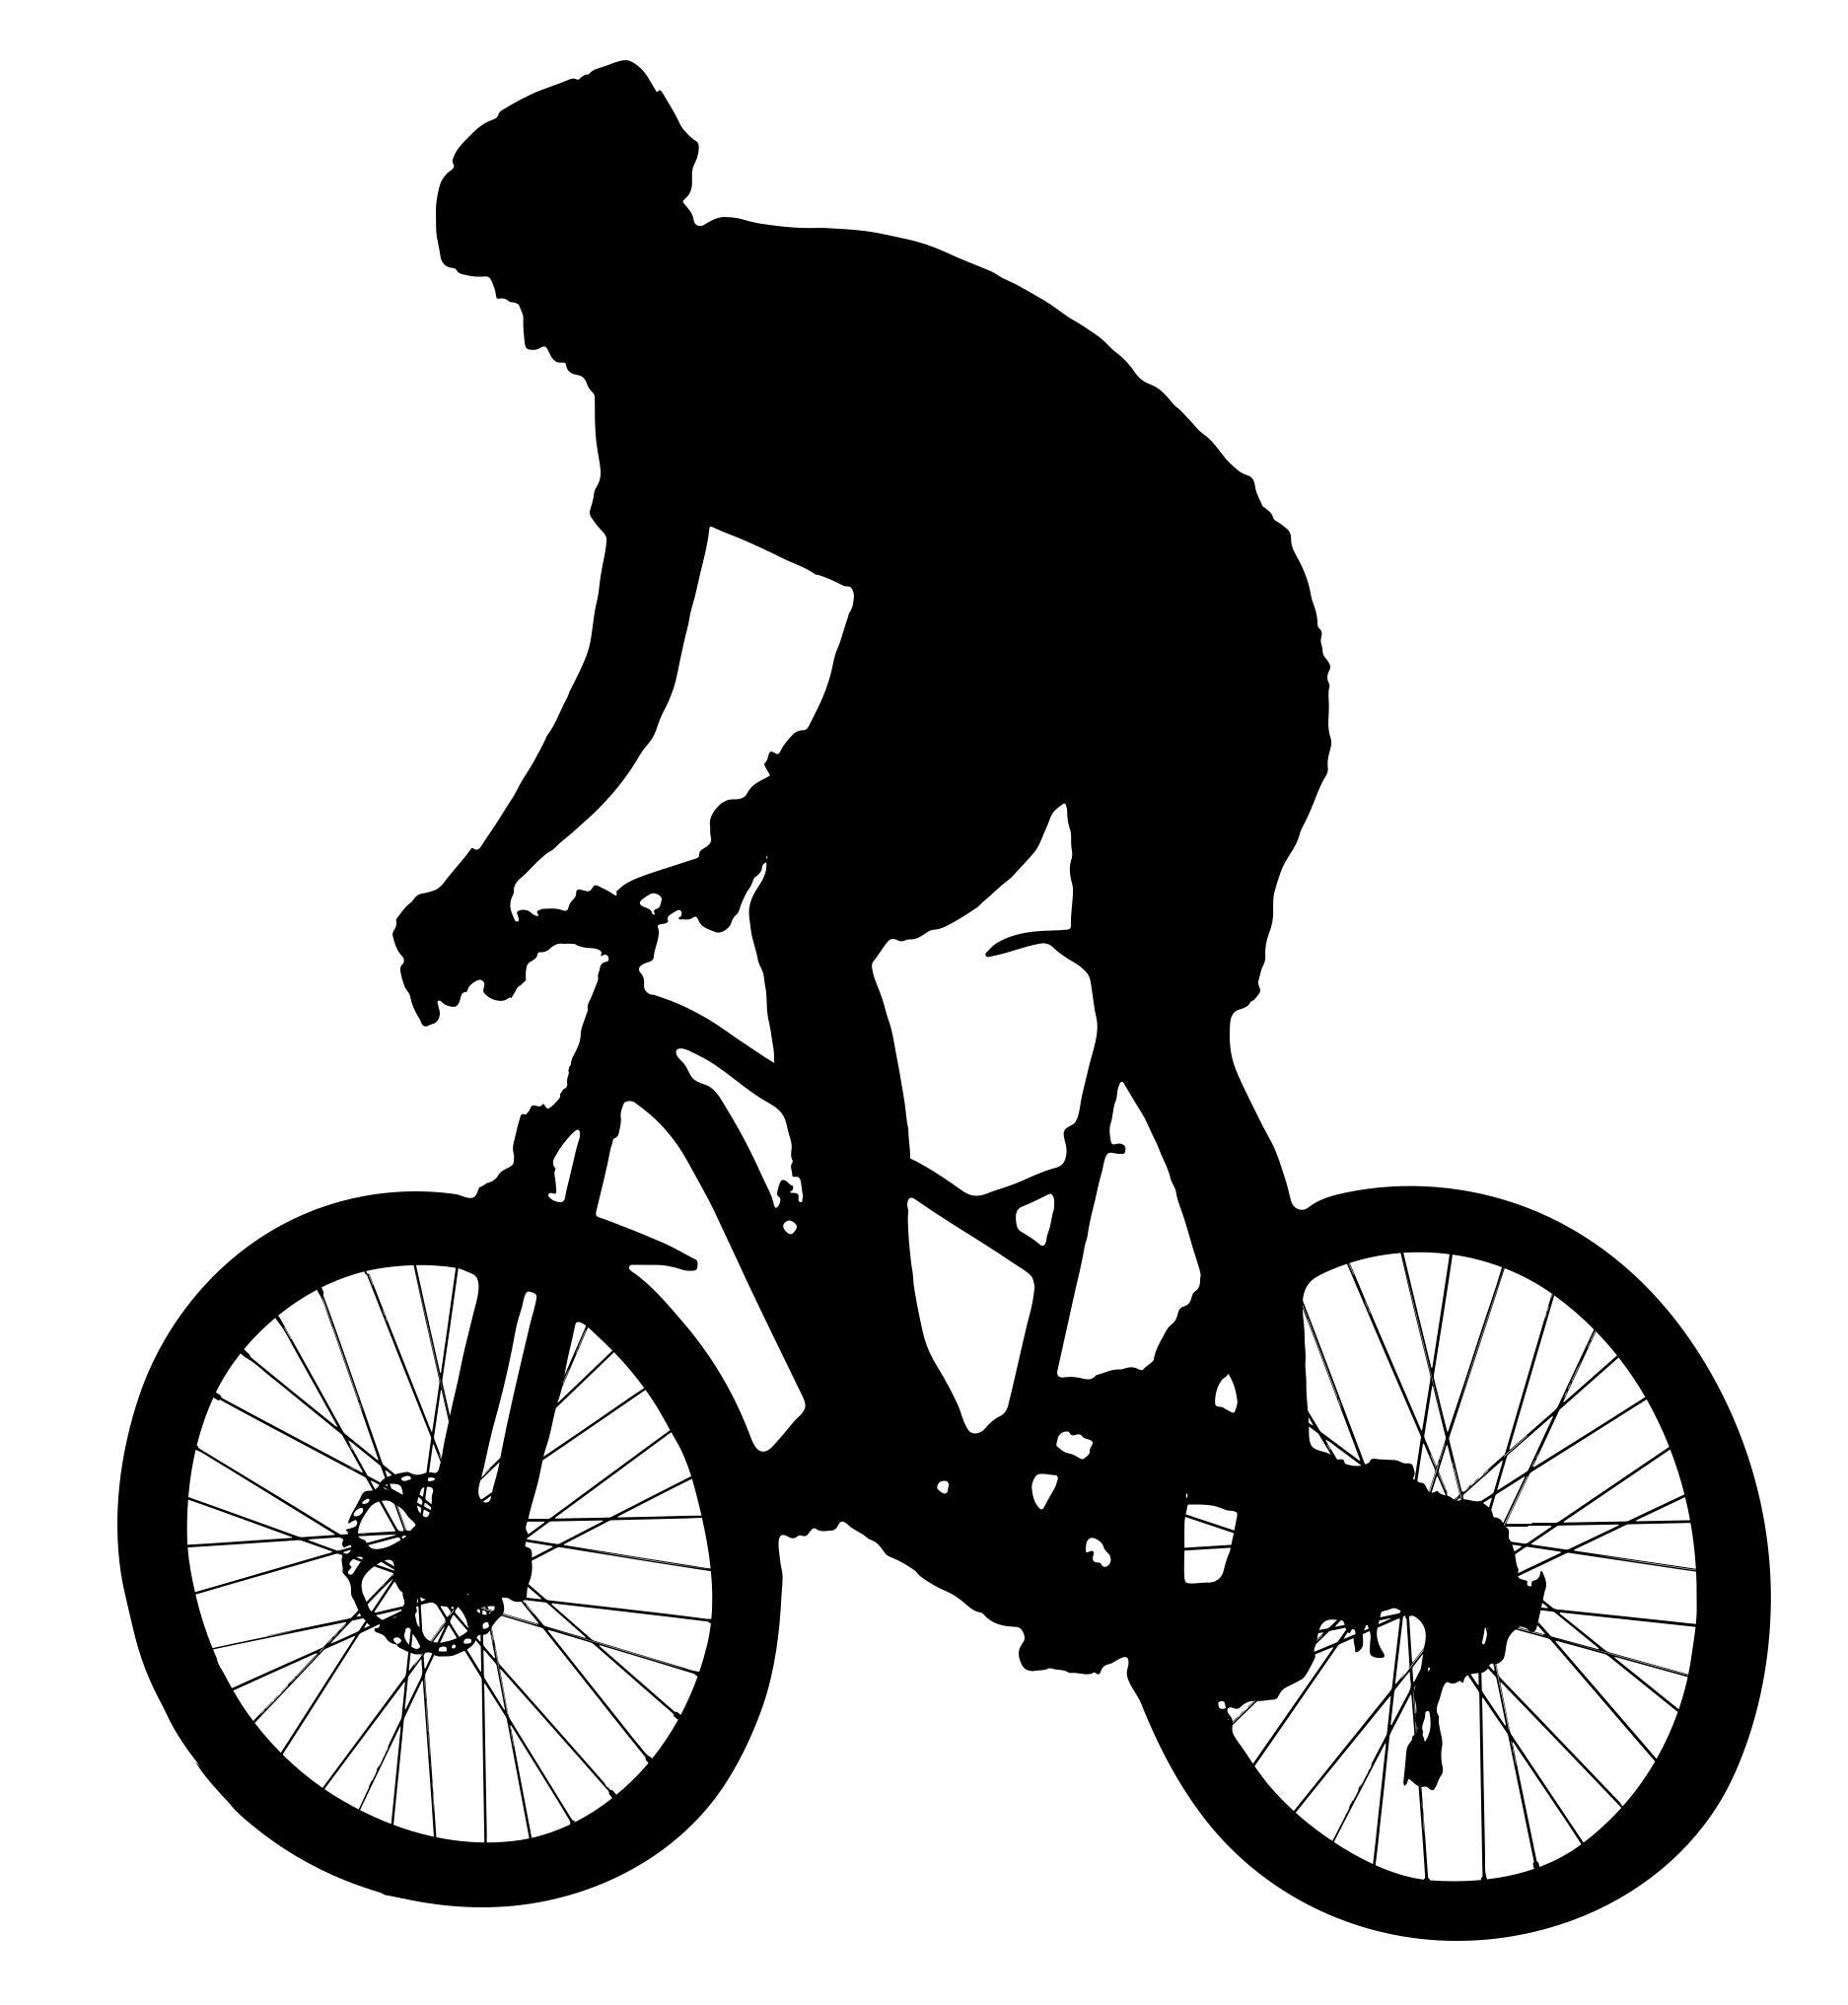 Biking clipart silhouette. Man racing on bike